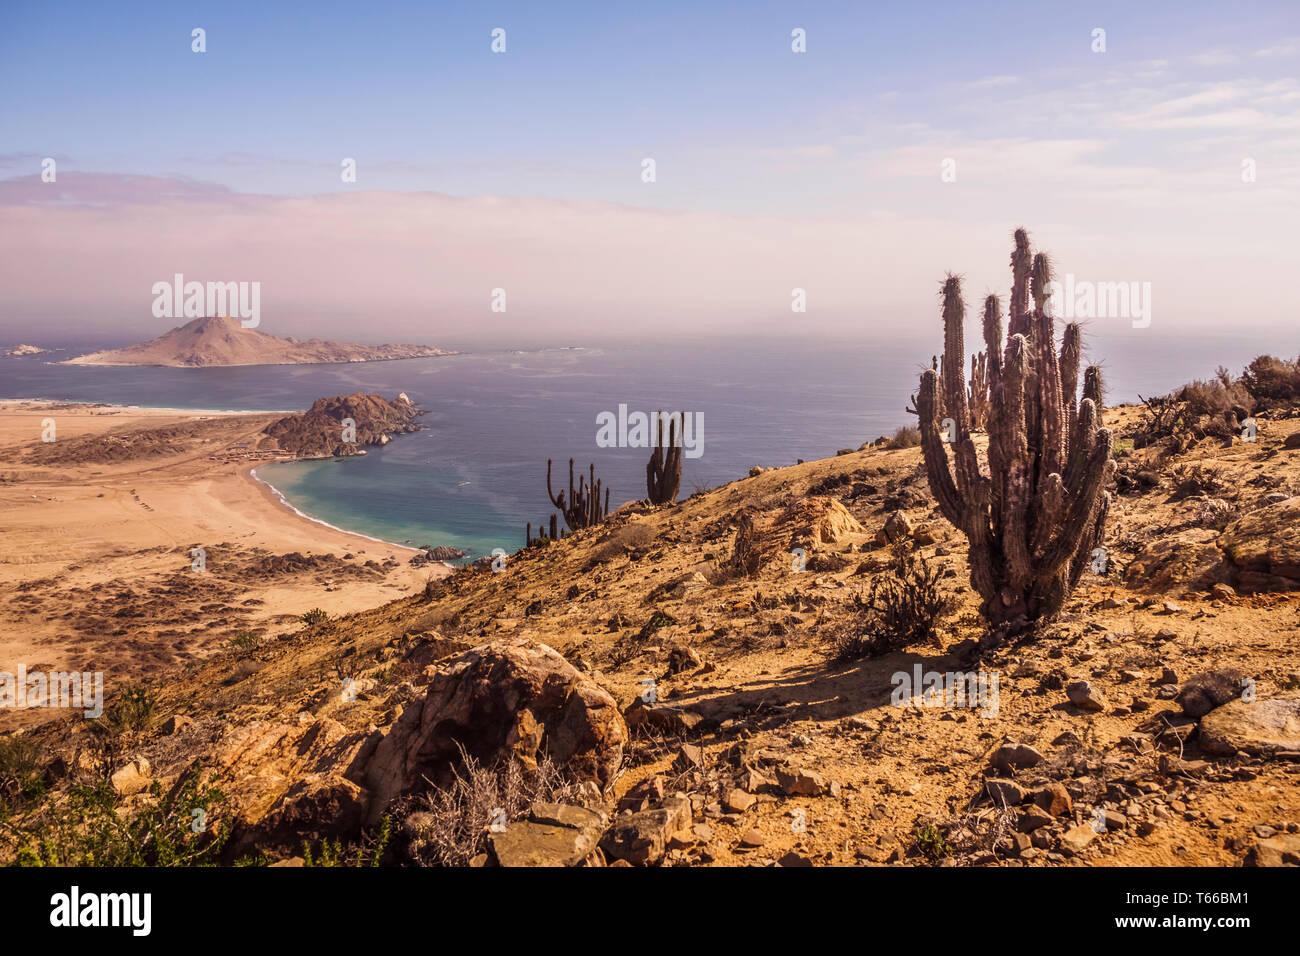 Coast of Pan de Azucar National Park in Chile. Atacama desert coast and cactus. desert landscape - Stock Image